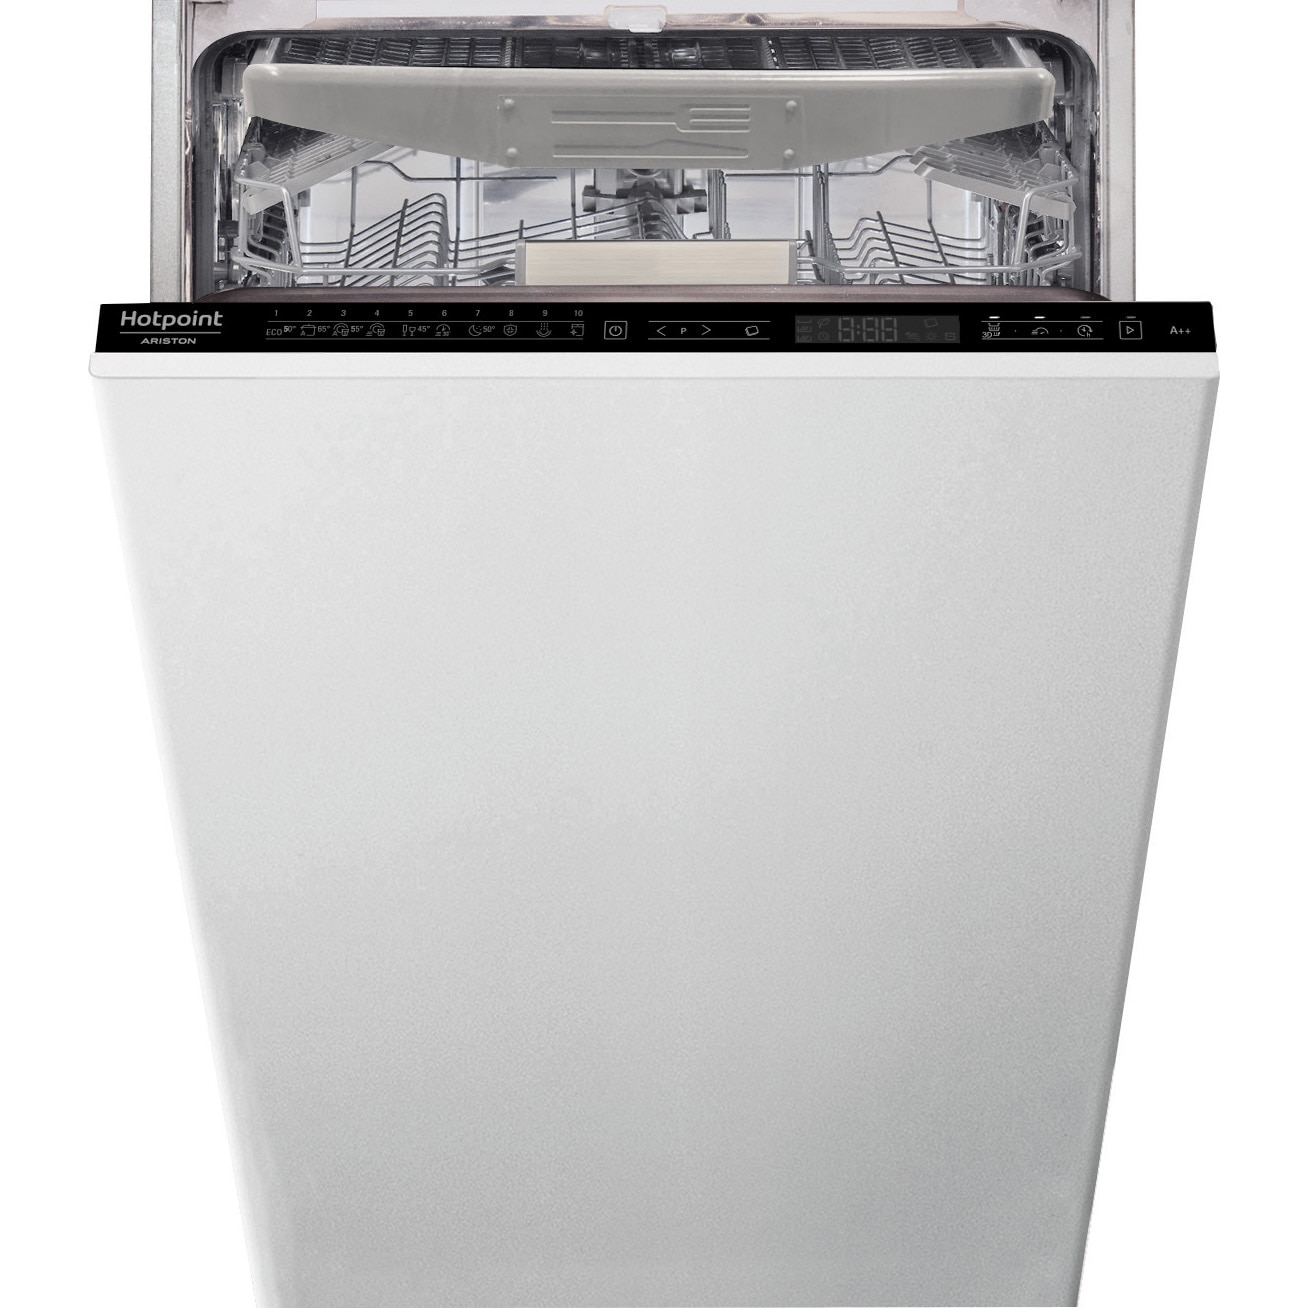 Fotografie Masina de spalat vase incorporabila Hotpoint HSIP4O21WFE, 10 seturi, 10 programe, Motor Inverter, Touch control, Clasa A++, 45 cm